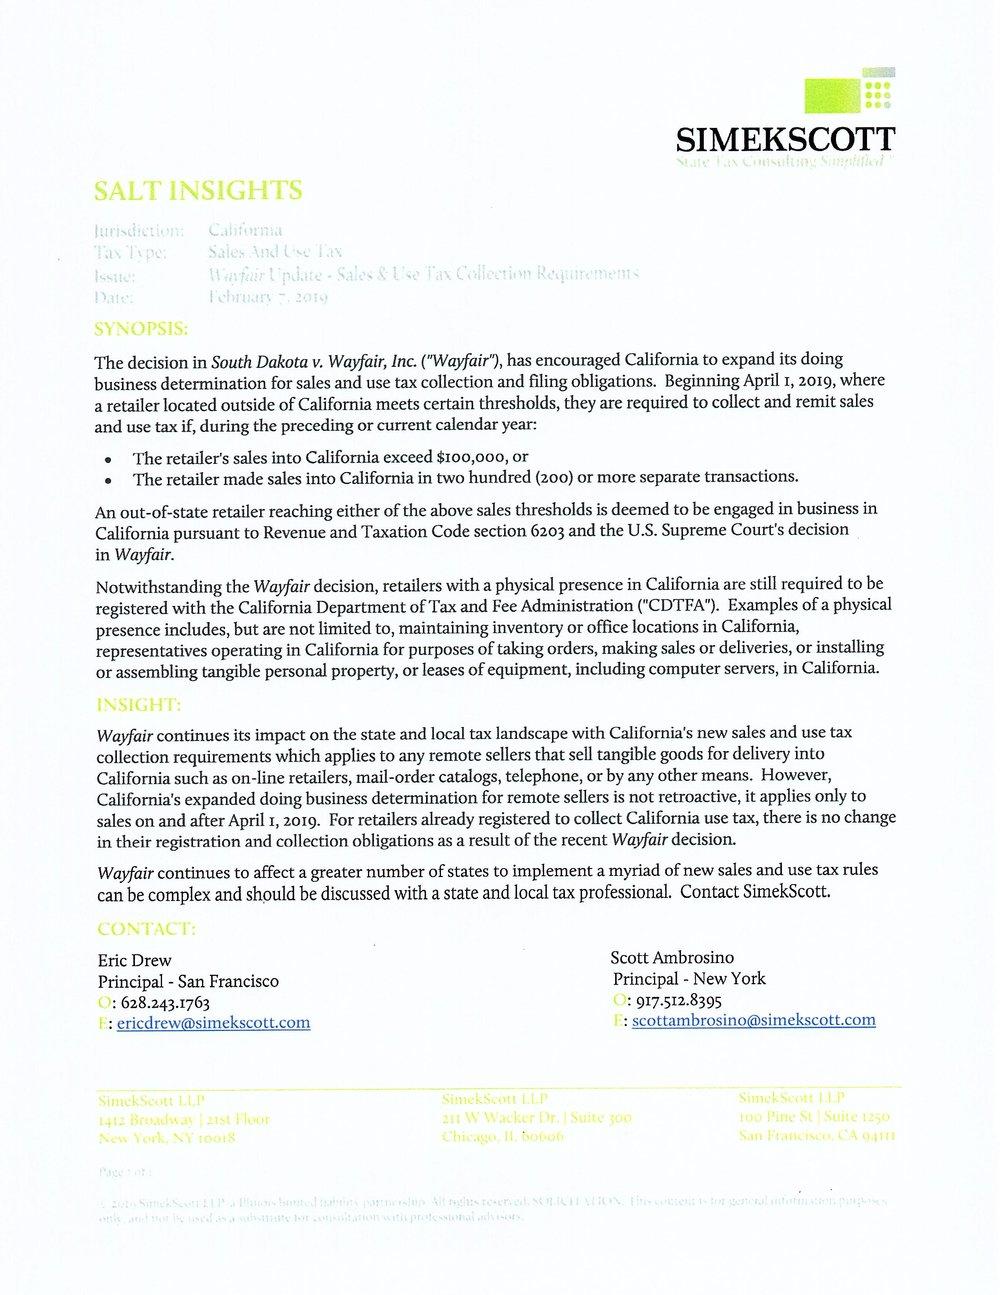 SimekScott_Wayfair_Update_California_Responds.jpg